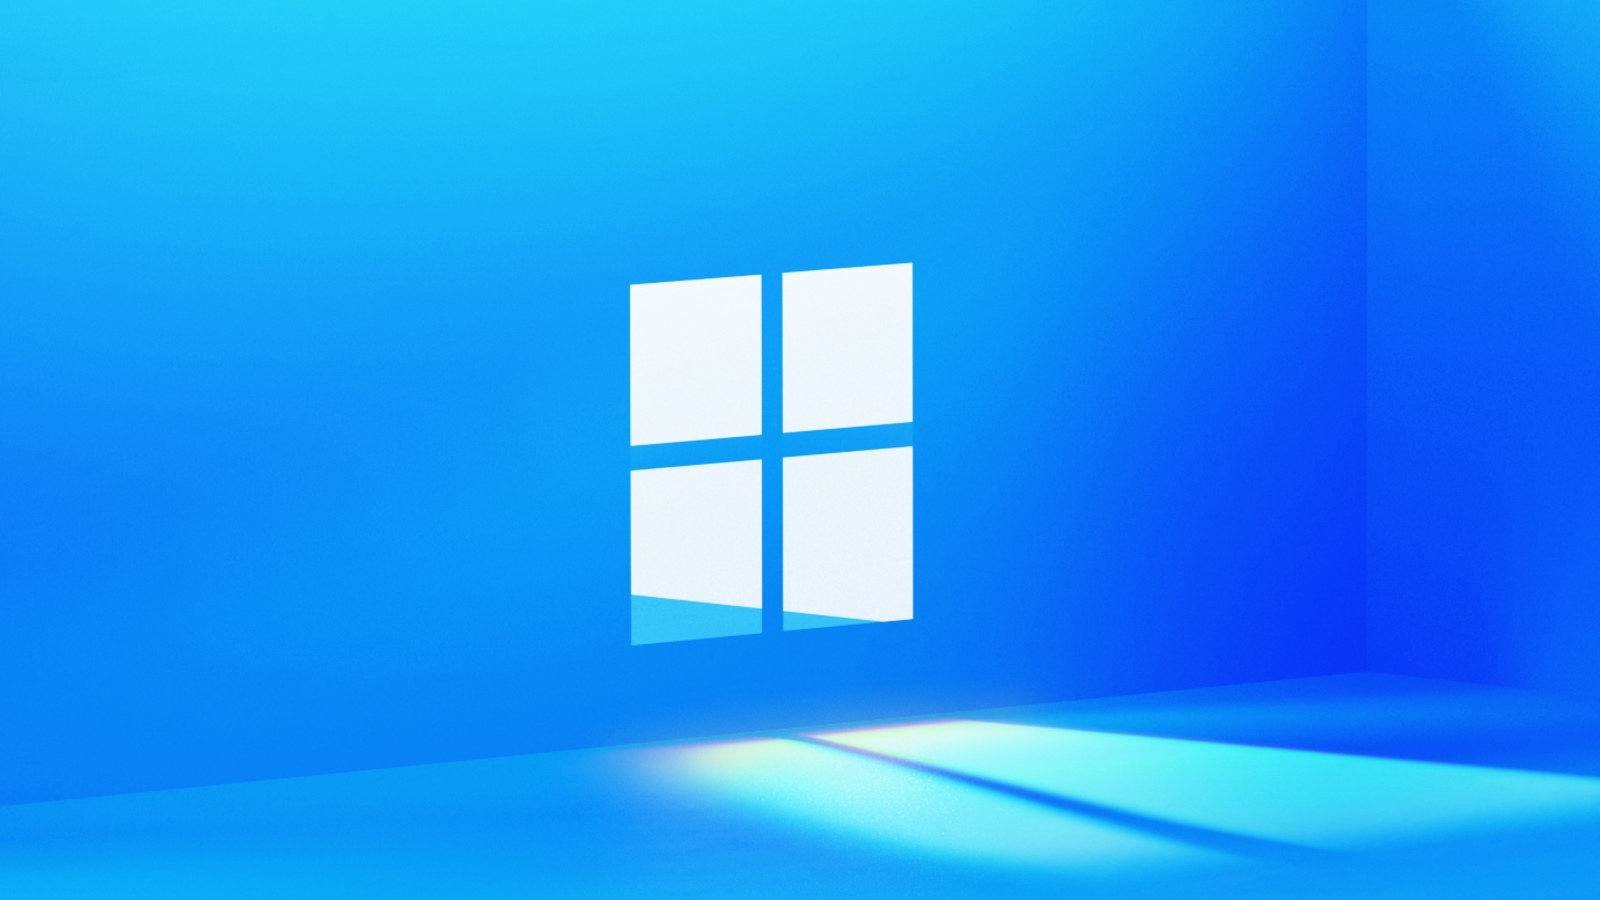 Microsoft to announce successor to Windows 10 on June 24